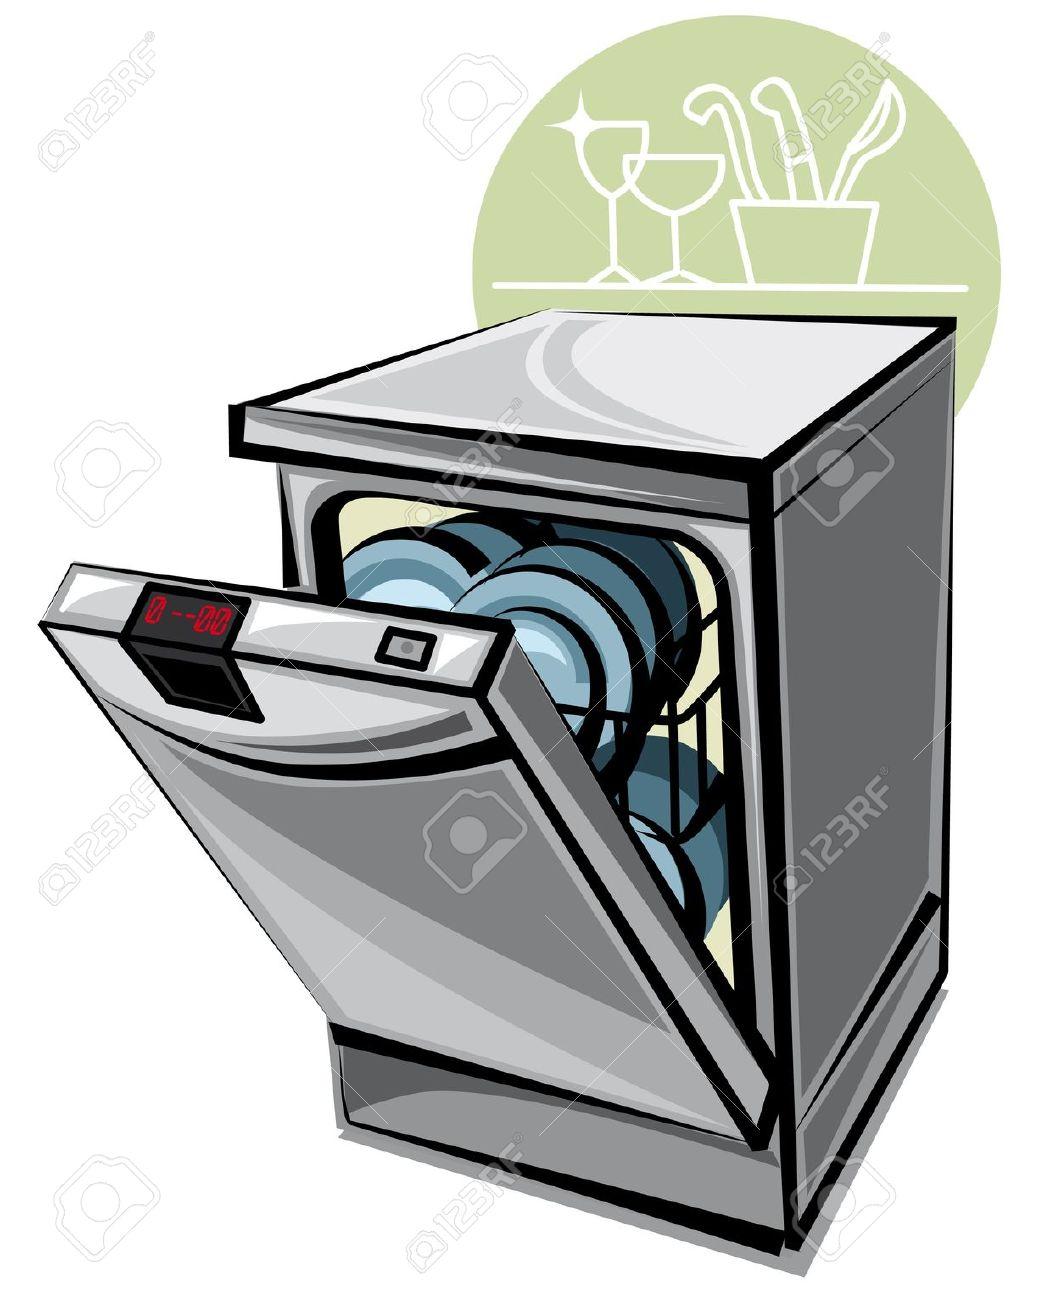 Dishwasher Clipart Clipground